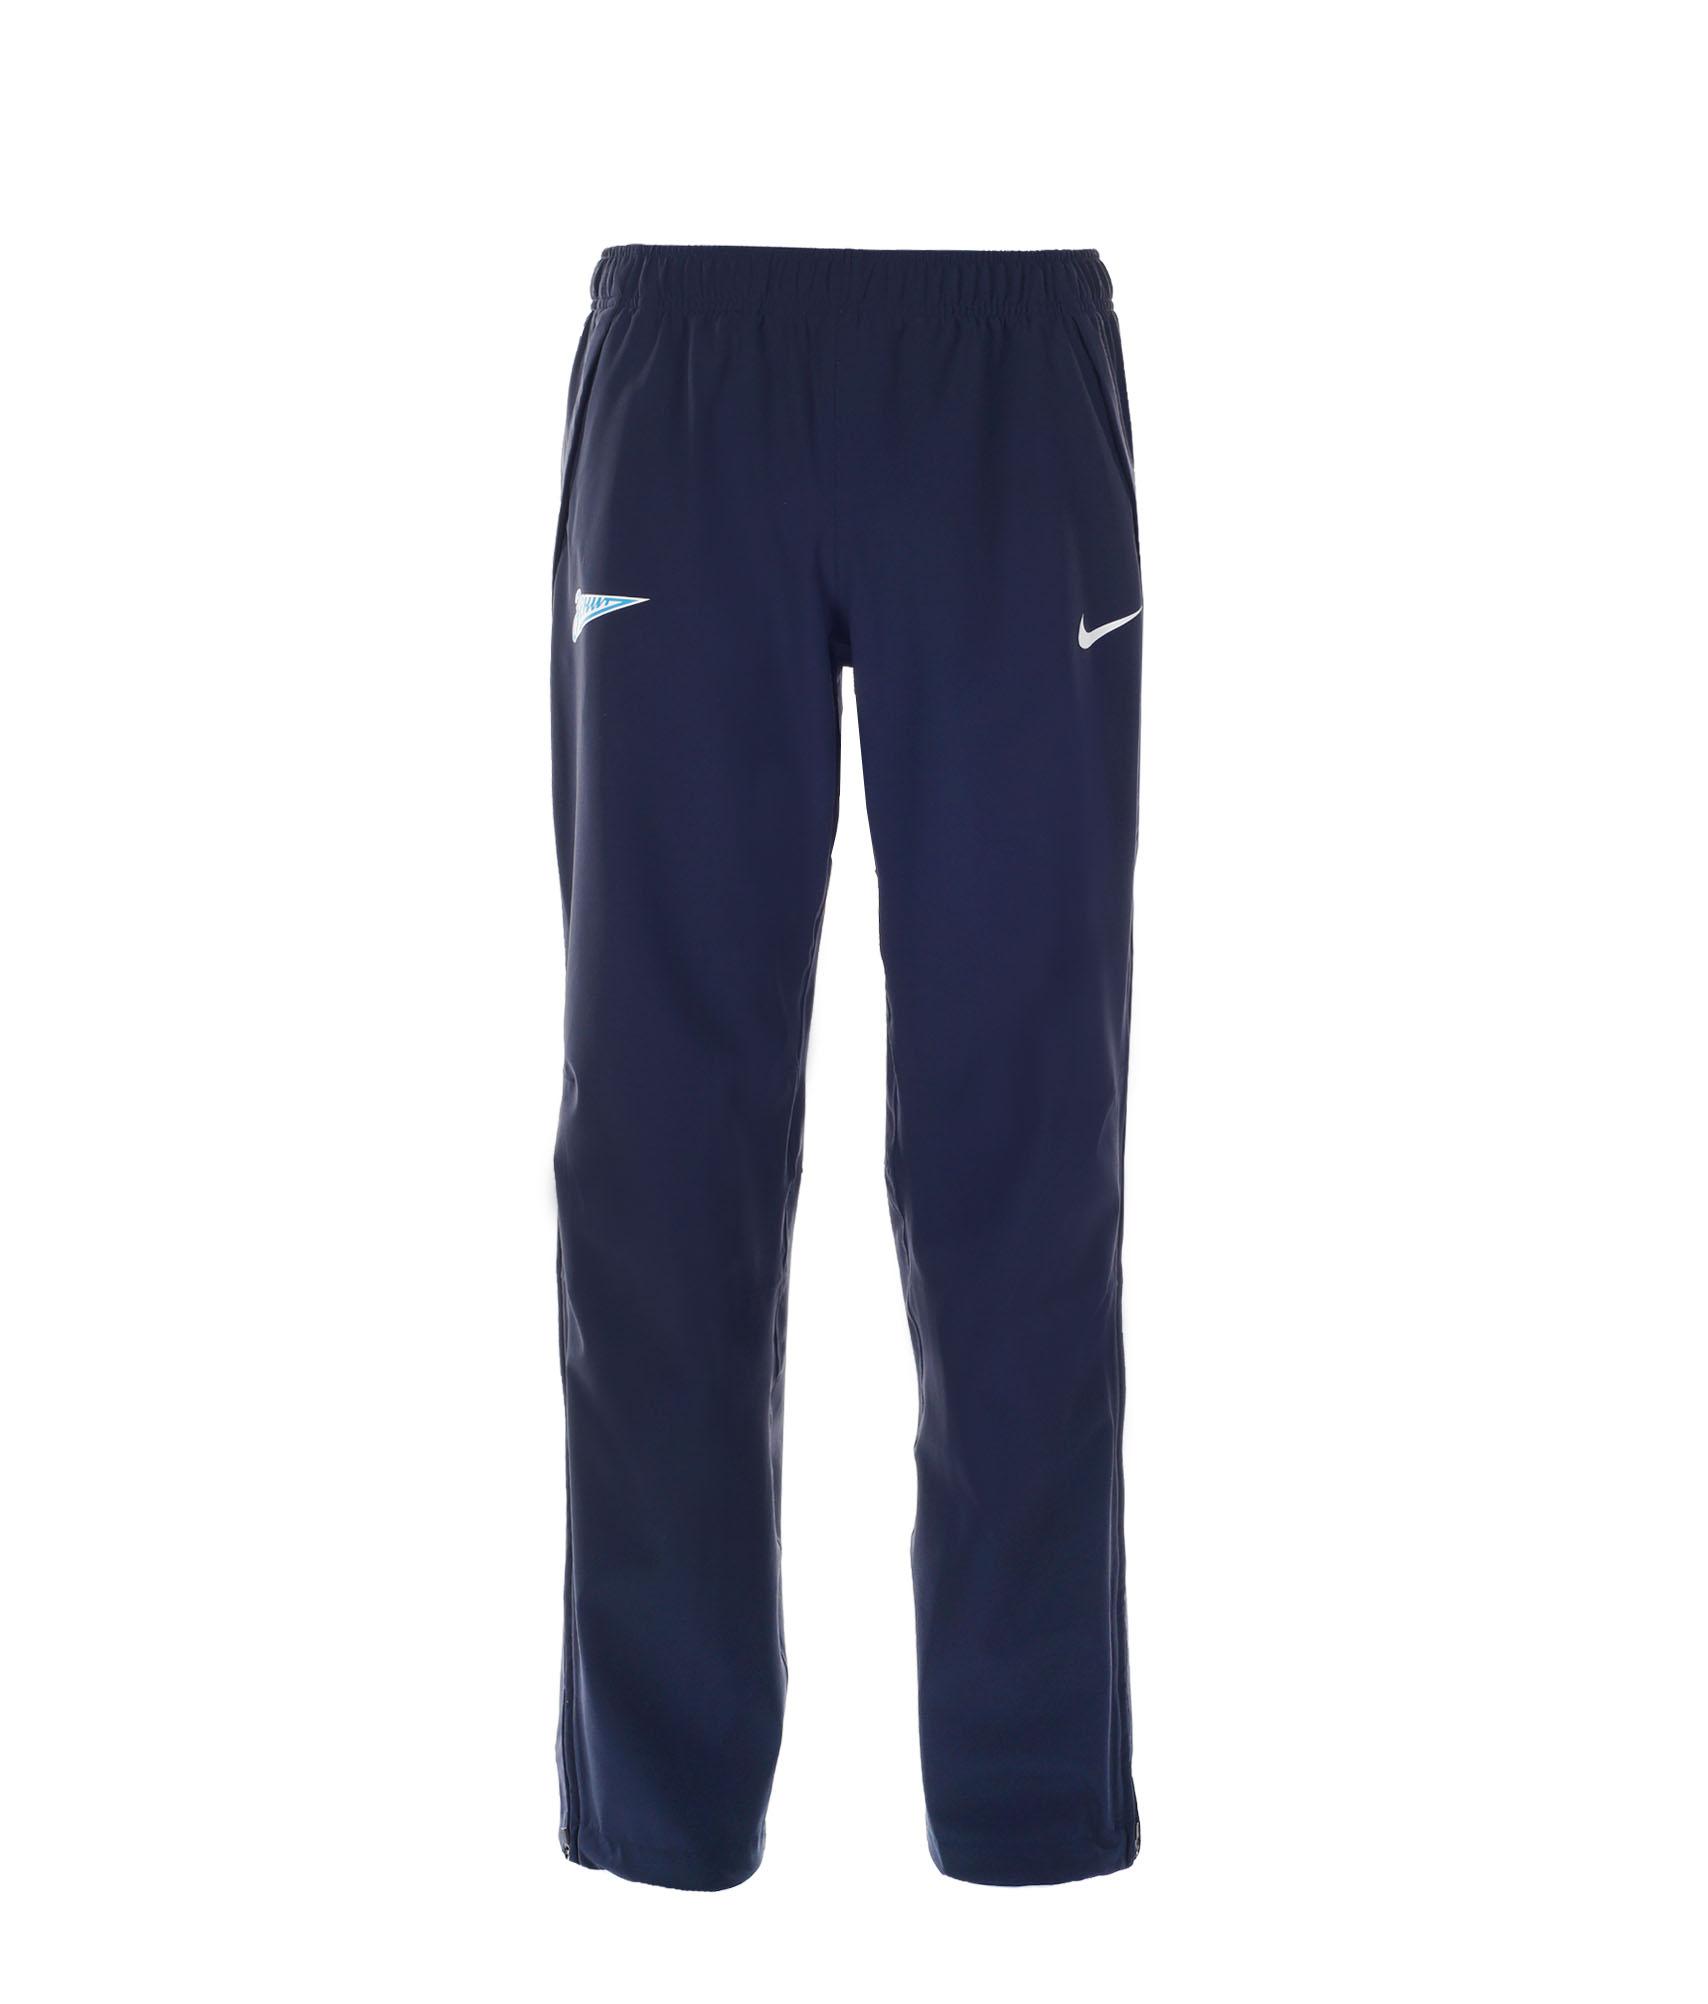 Брюки Nike Zenit Select Pro Rain Pant, Цвет-Синий, Размер-M